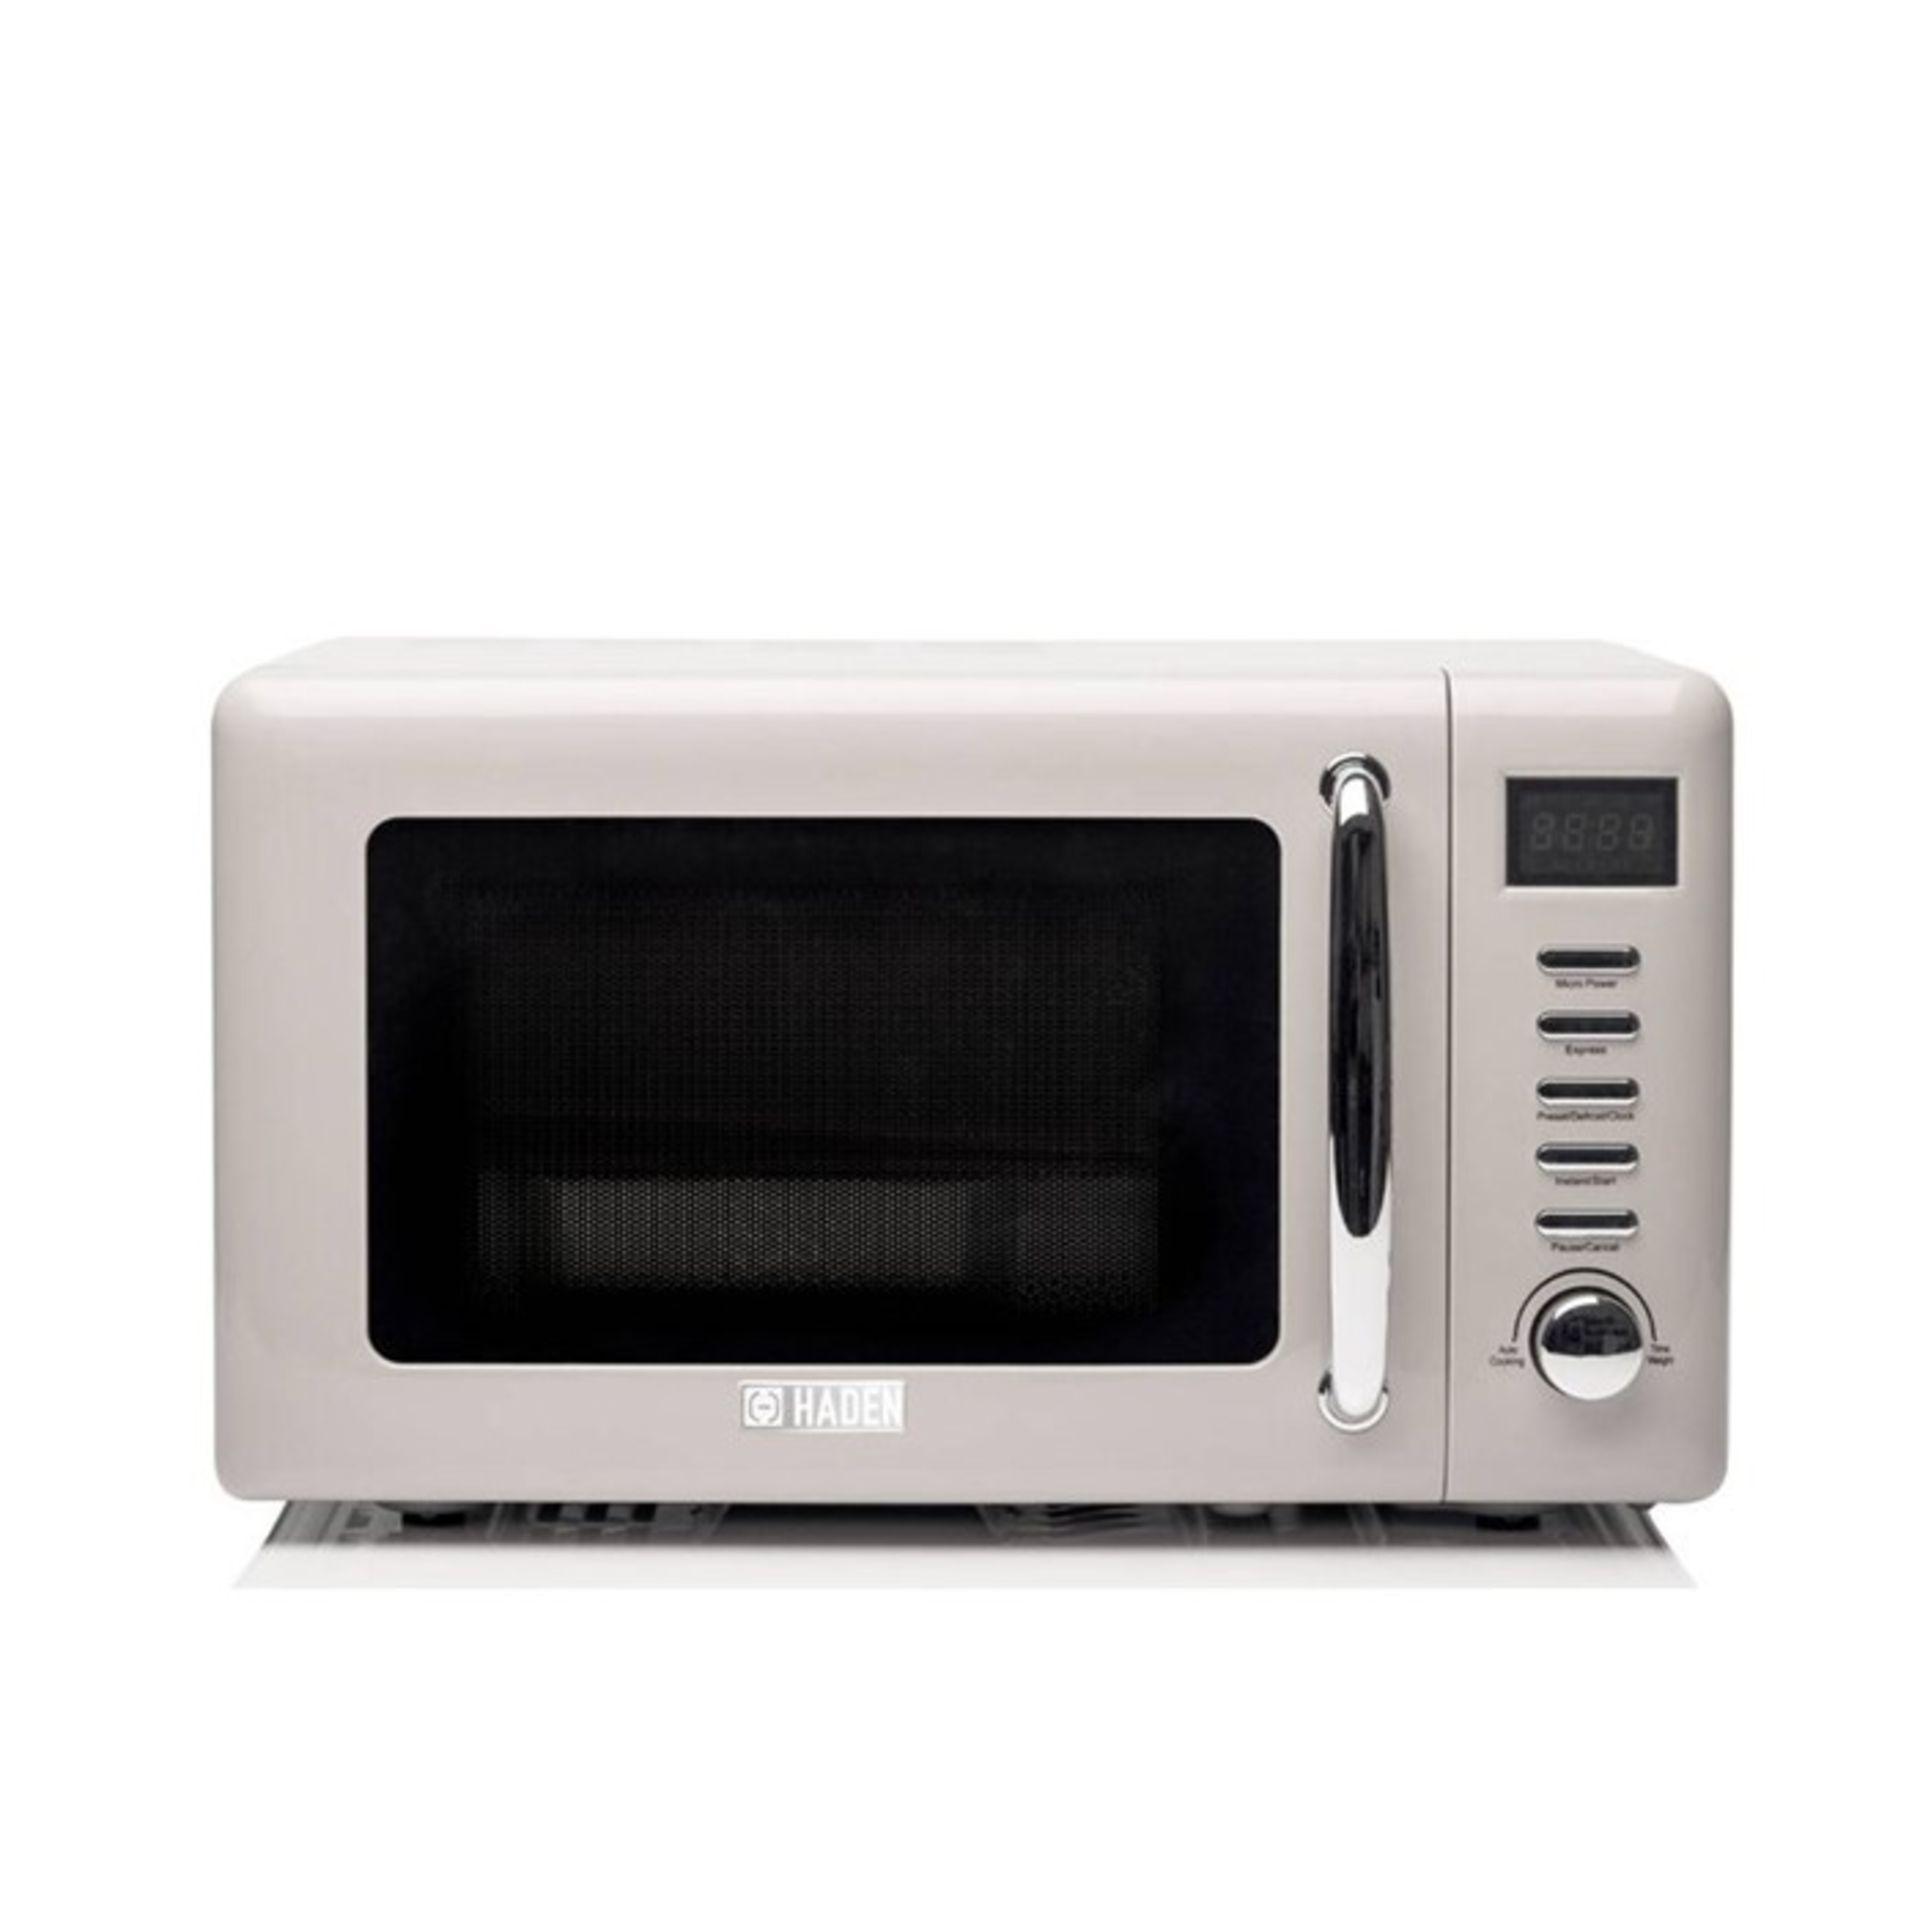 HADEN, Cotswold 20 L 800W Countertop Microwave - RRP£80 (HDEN1052 - 22262/6) 1J